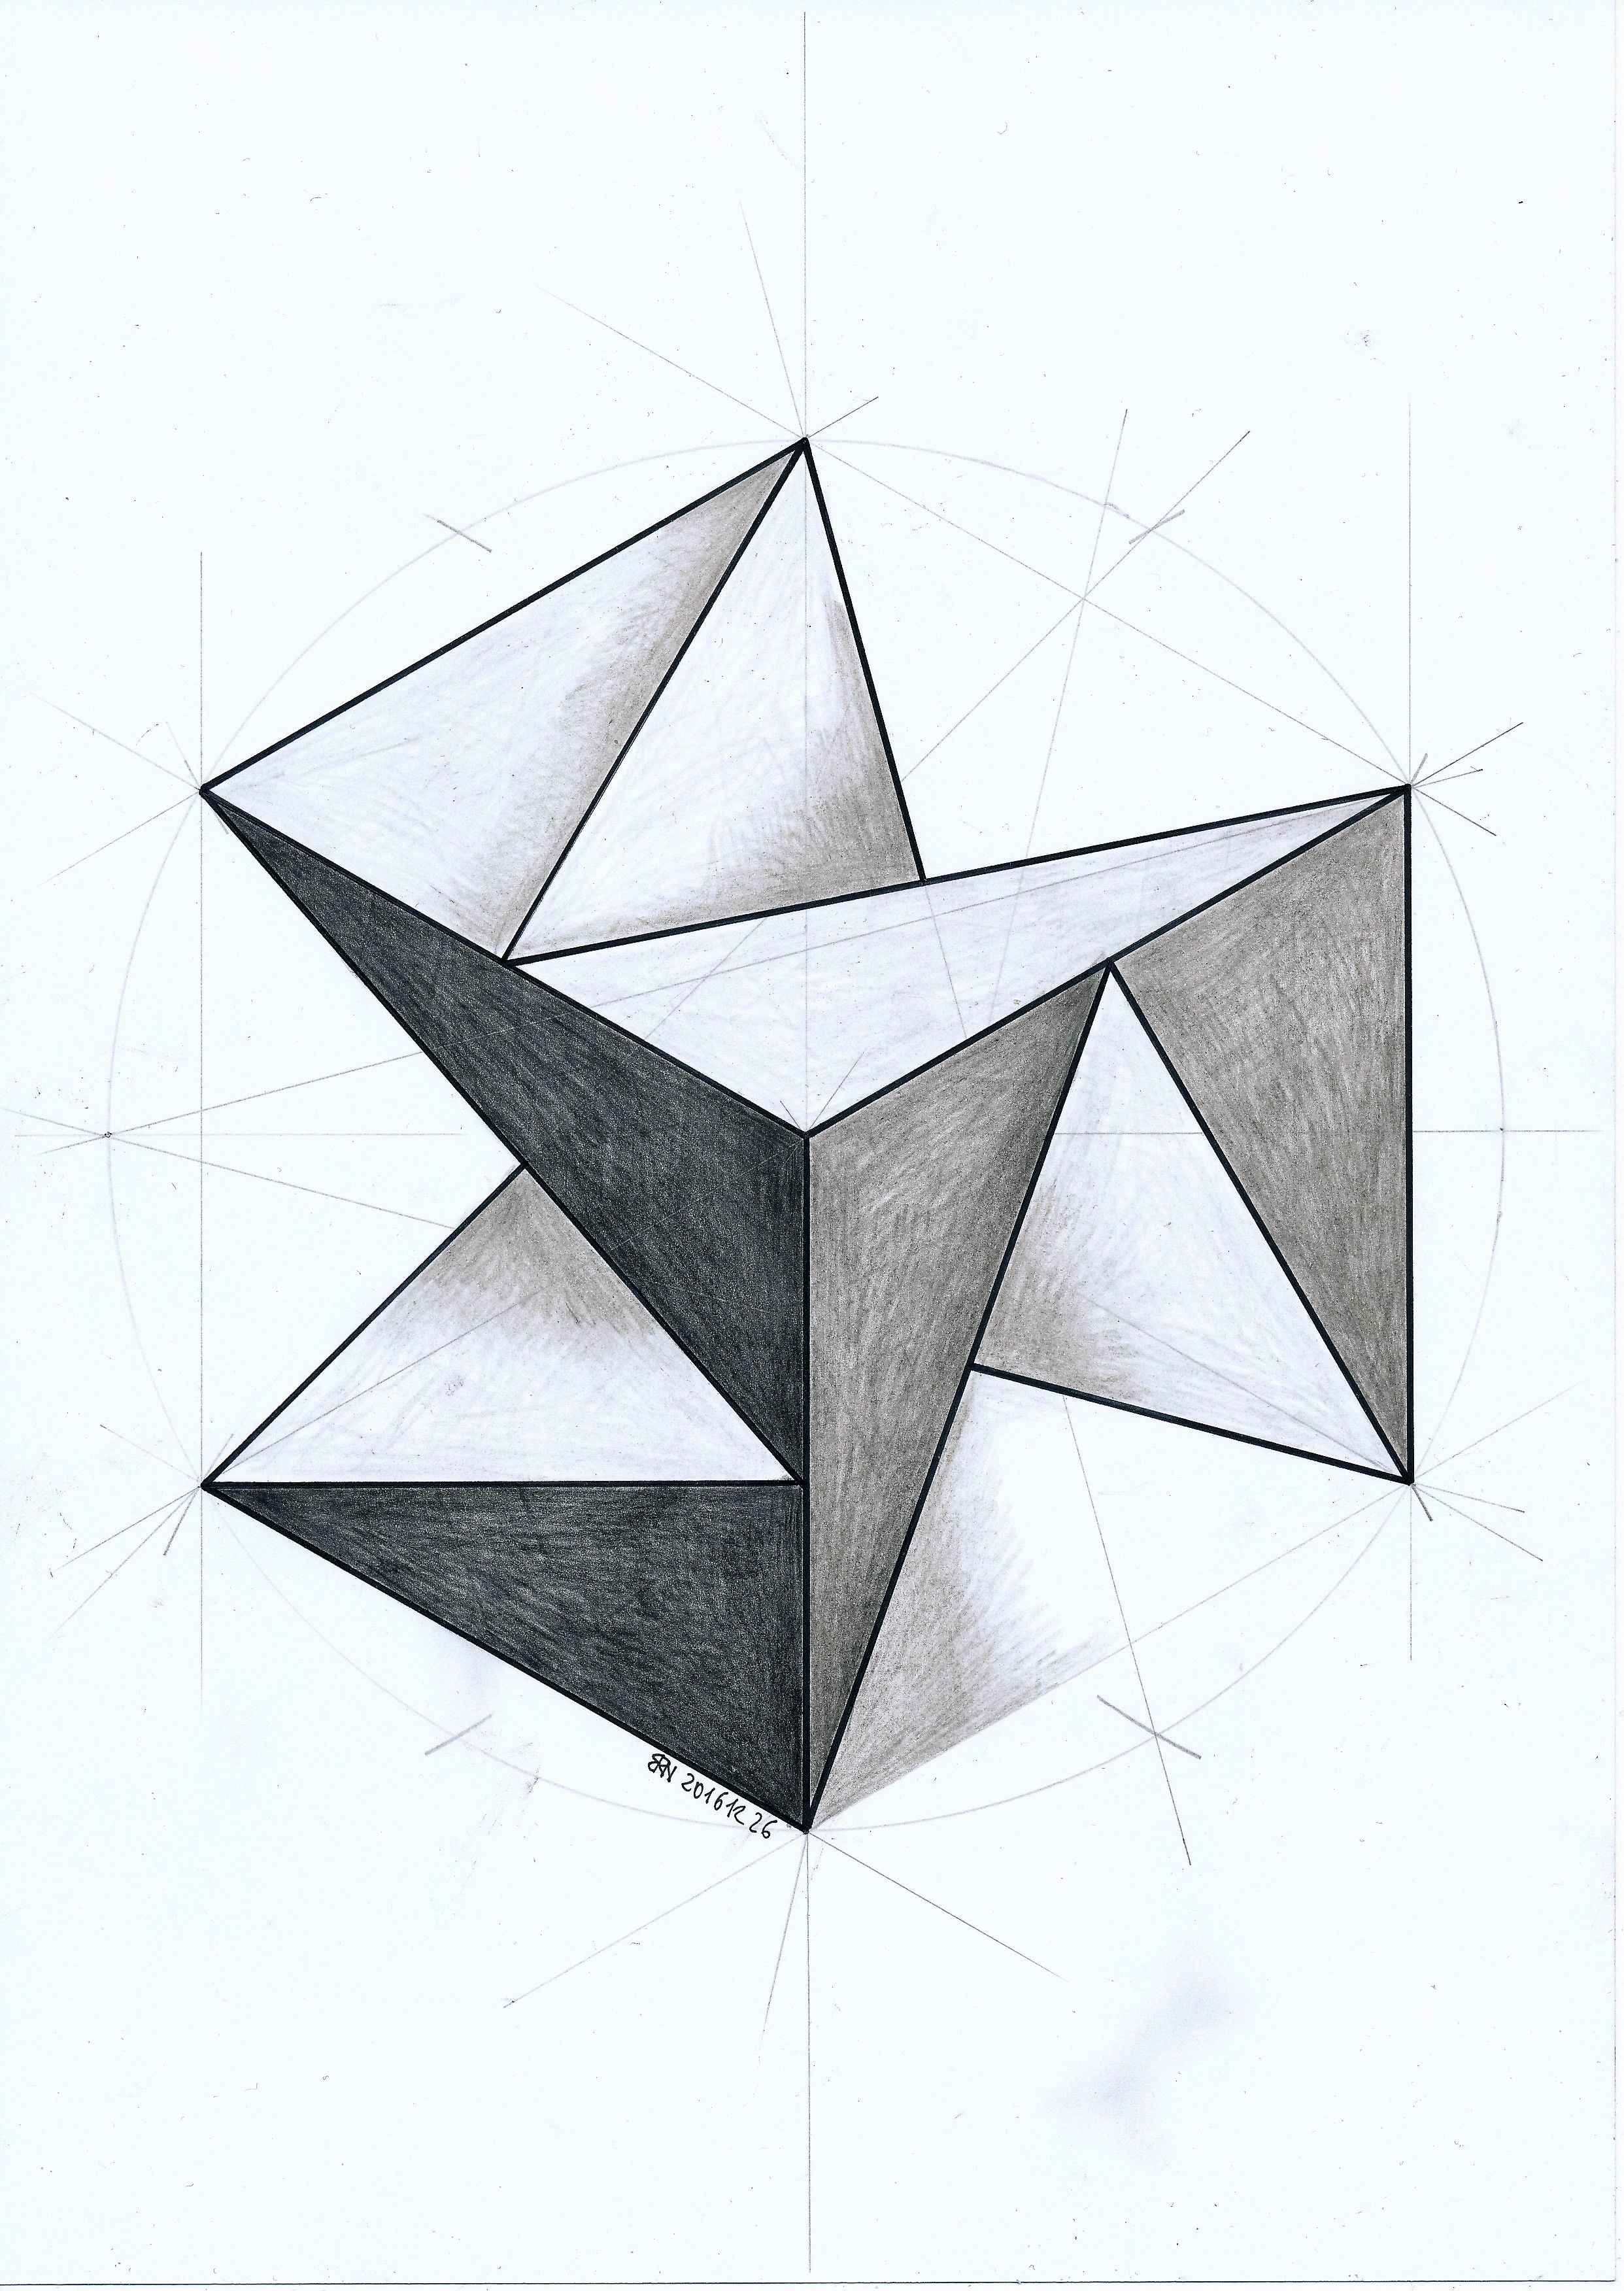 #Polyhedra #Solid #Geometry #Symmetry #Pattern #Handmade #Escher #Pastel